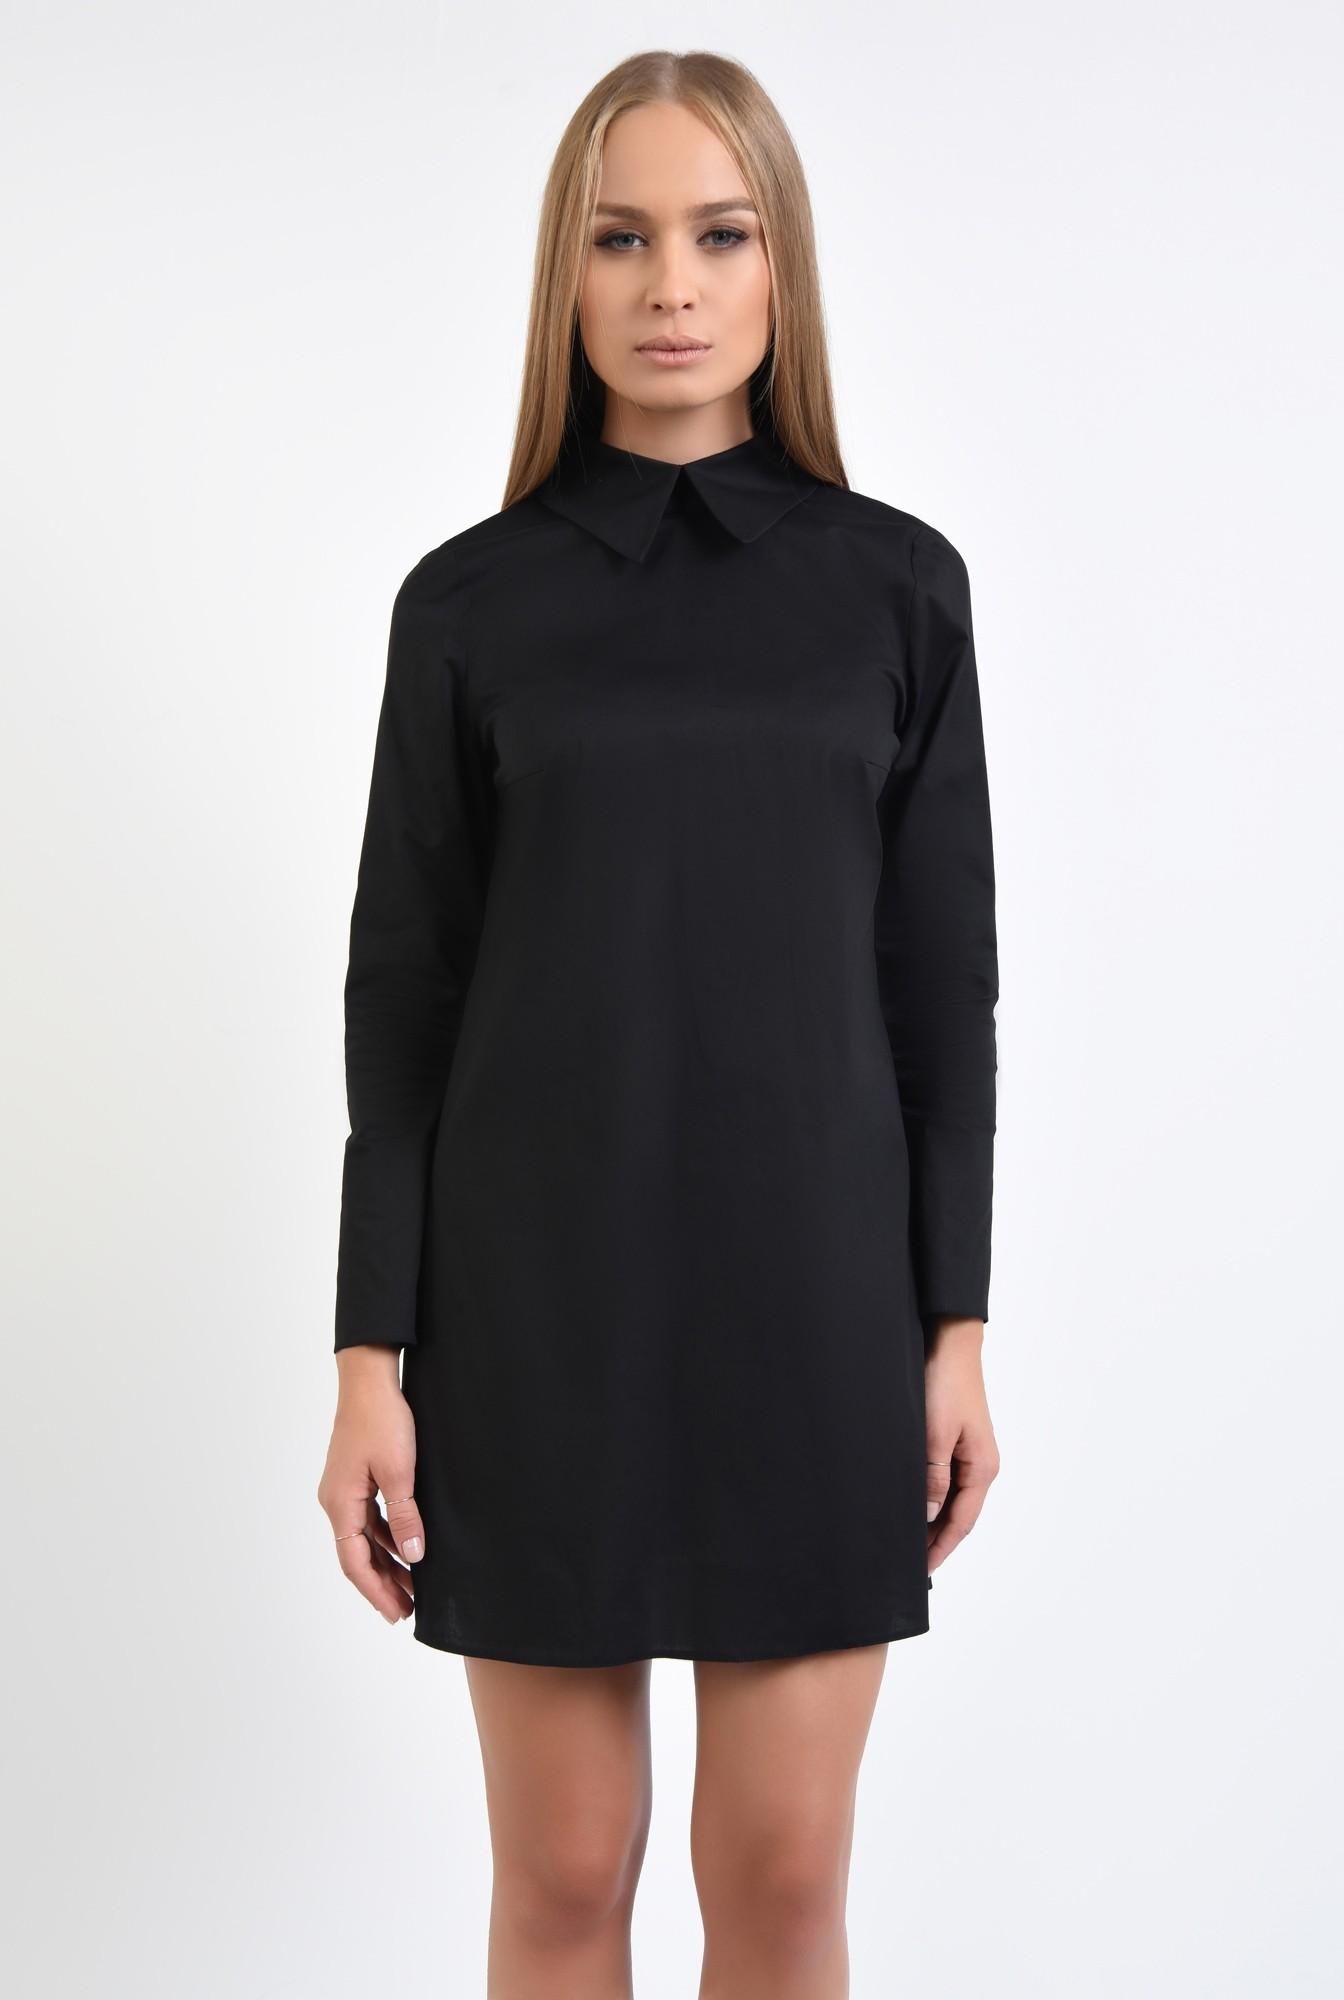 2 - rochie casual, stil camasa, guler ascutit, rochii online